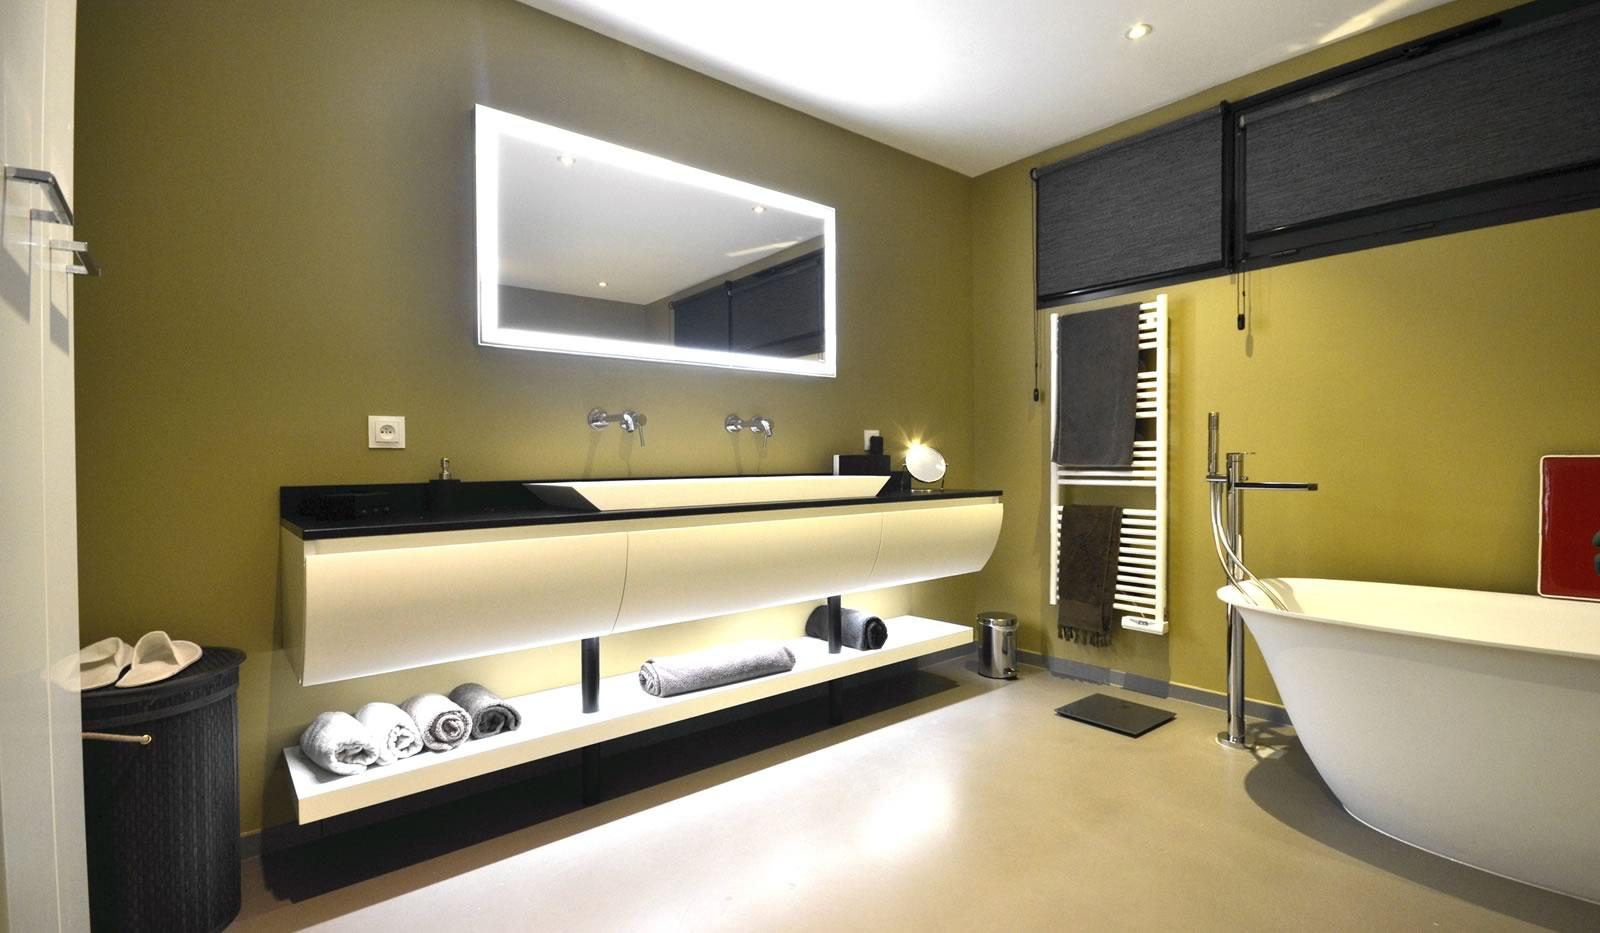 salle de bain nantes affordable maison ossature bois natigreen with salle de bain nantes good. Black Bedroom Furniture Sets. Home Design Ideas